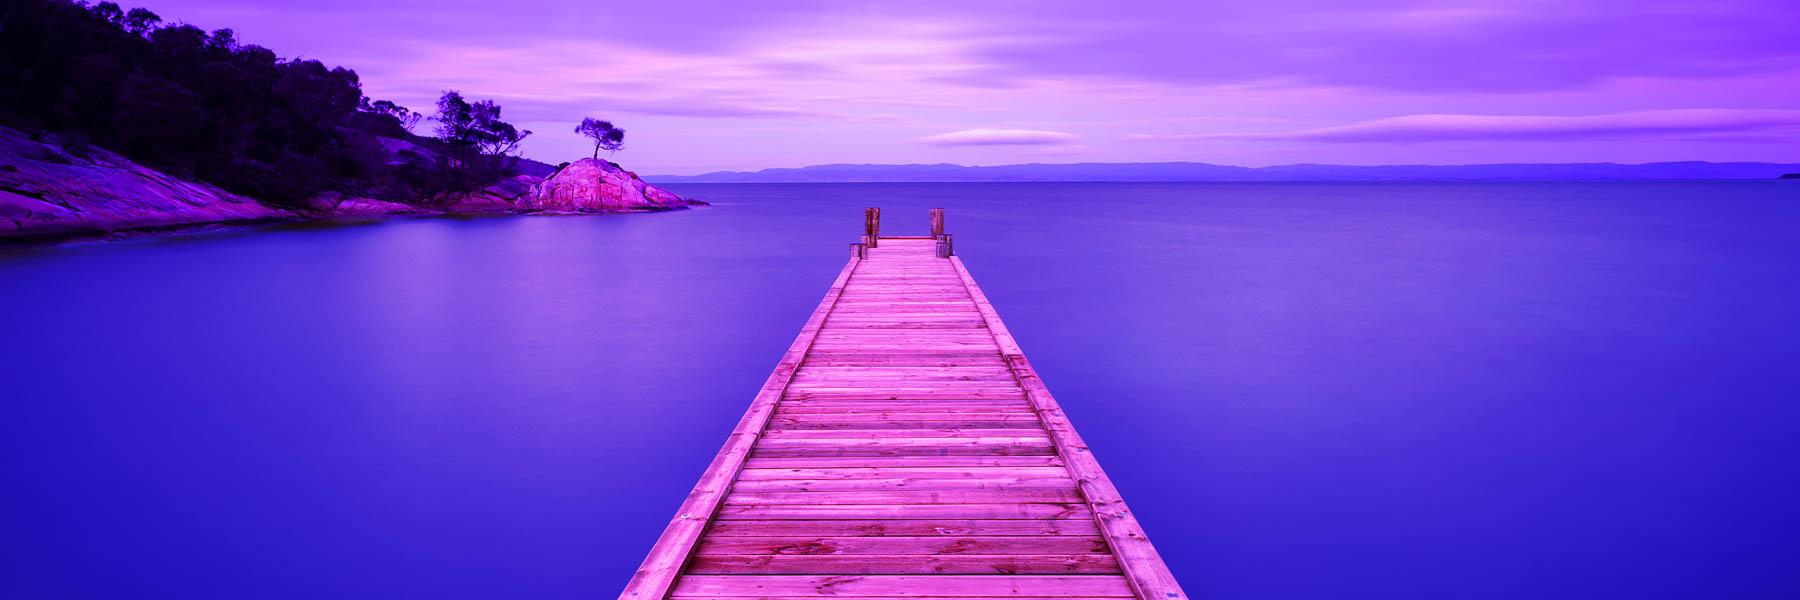 A serene pastel sunrise over Coleas Bay, Tasmania, Australia.